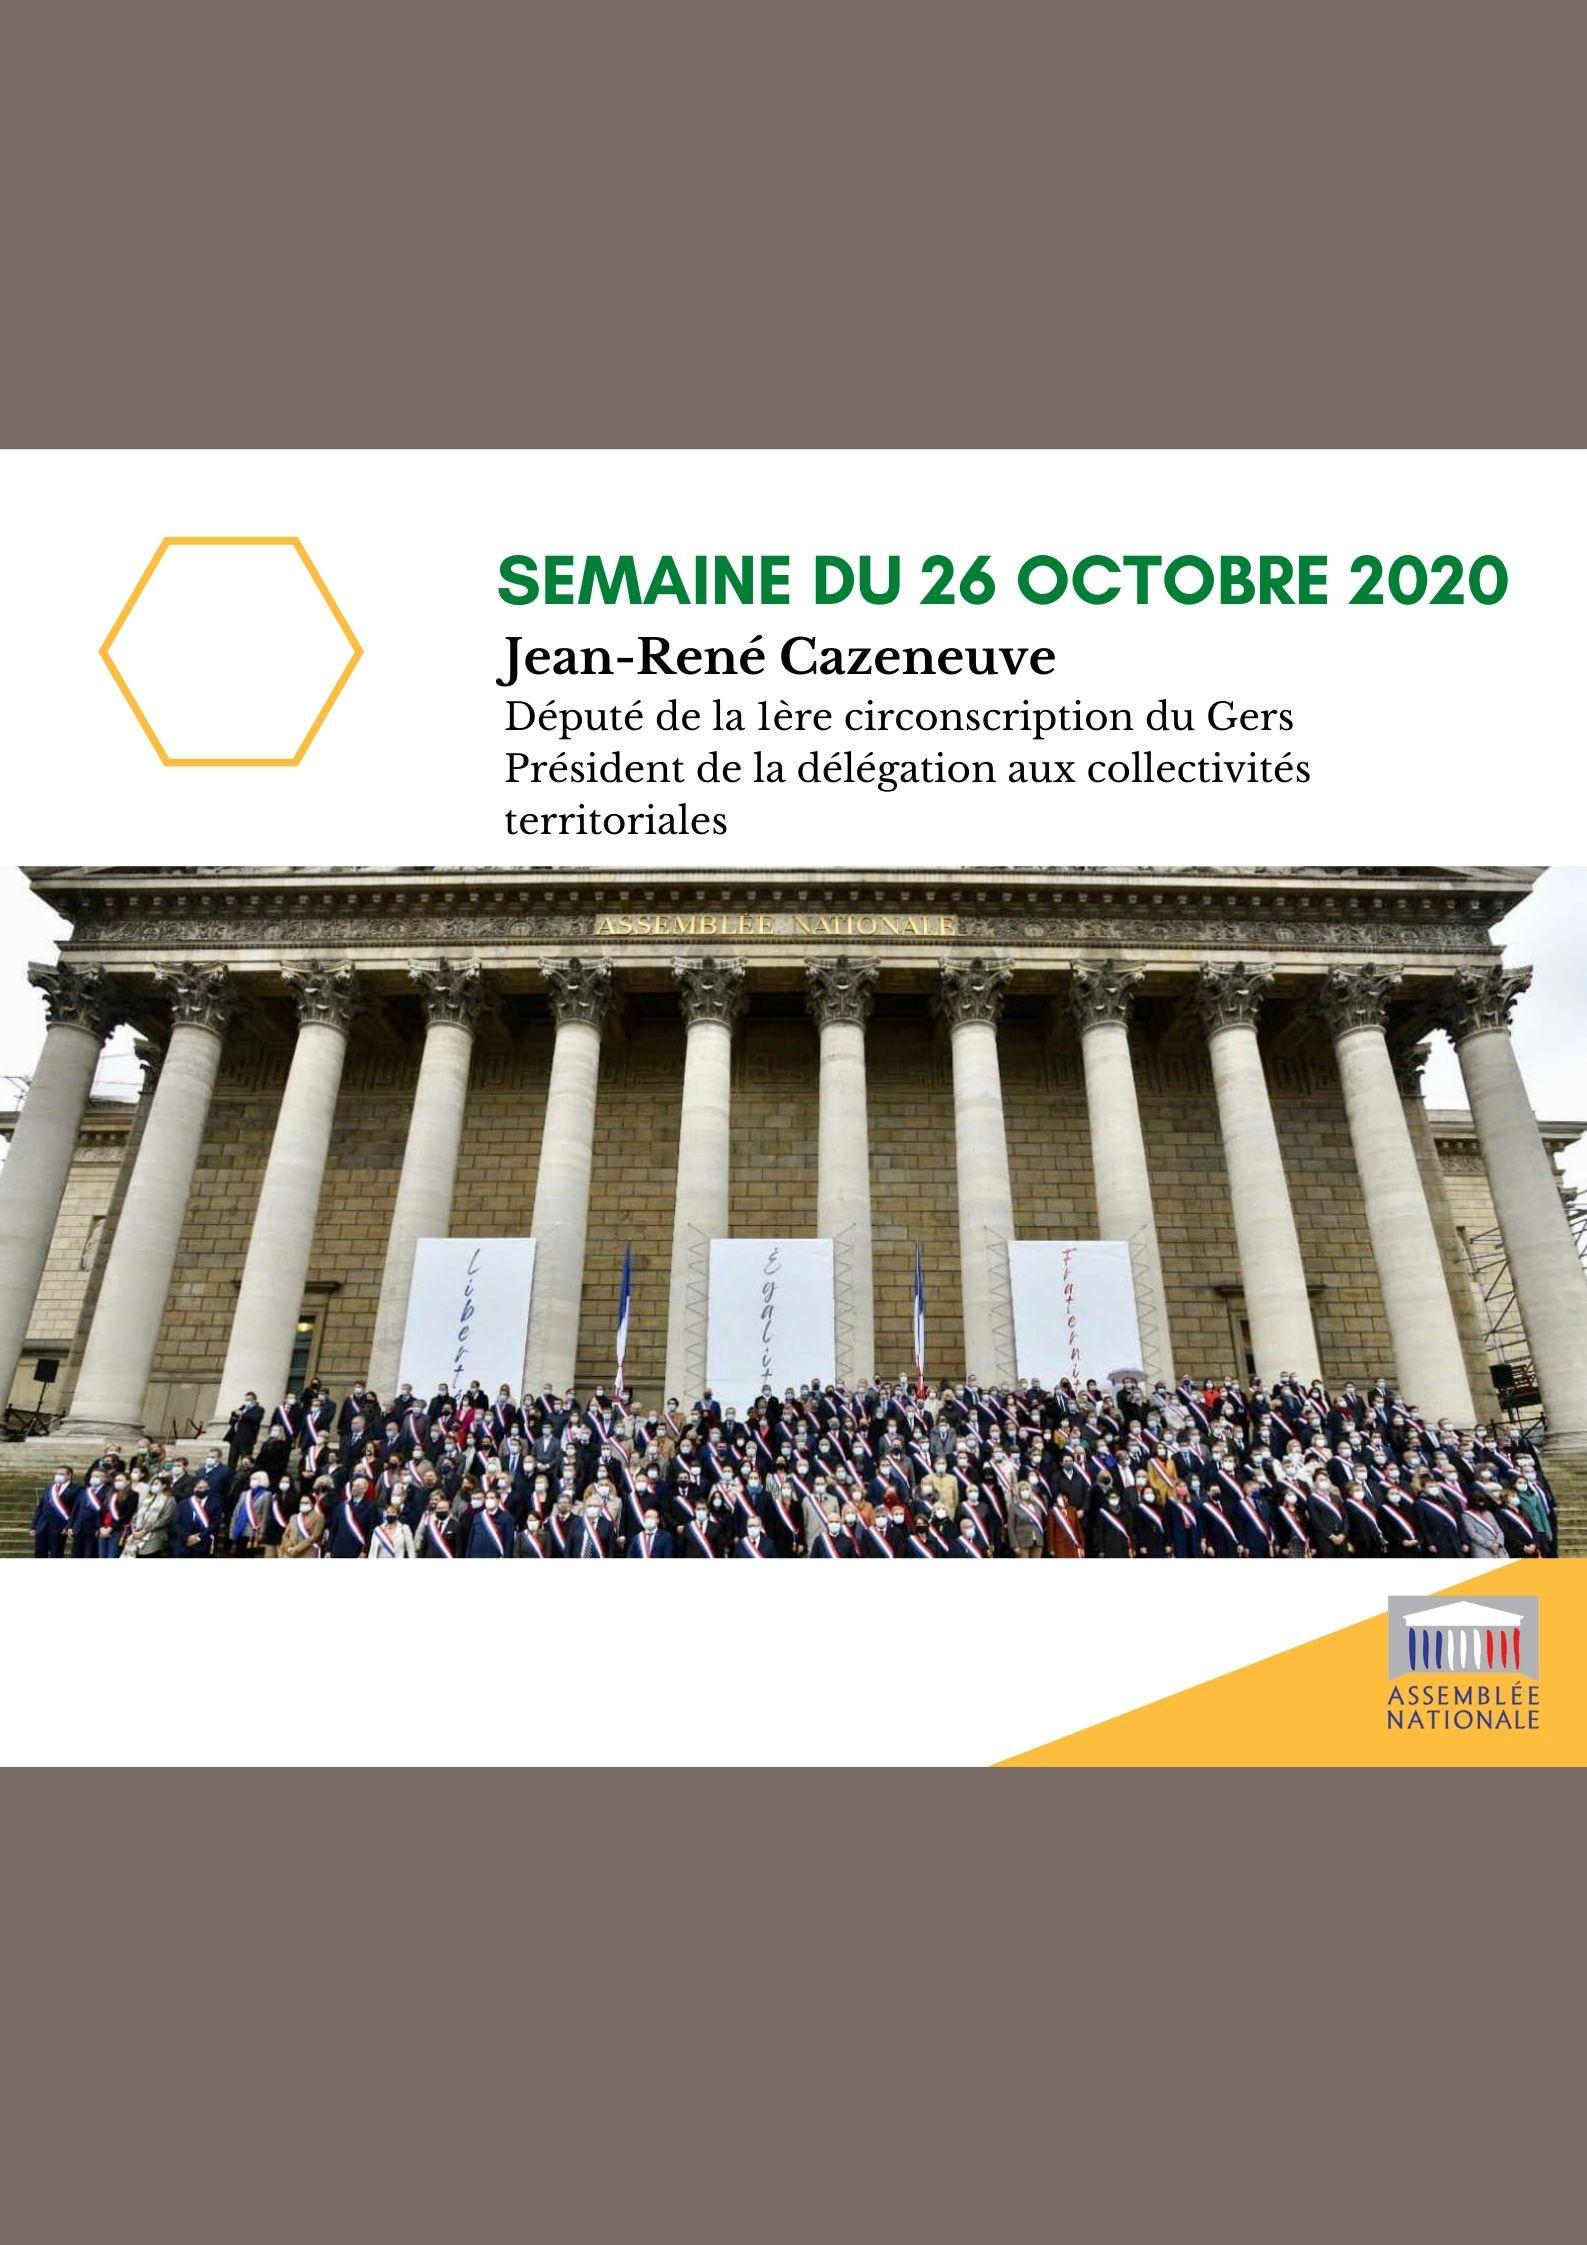 Semaine du 26 octobre 2020